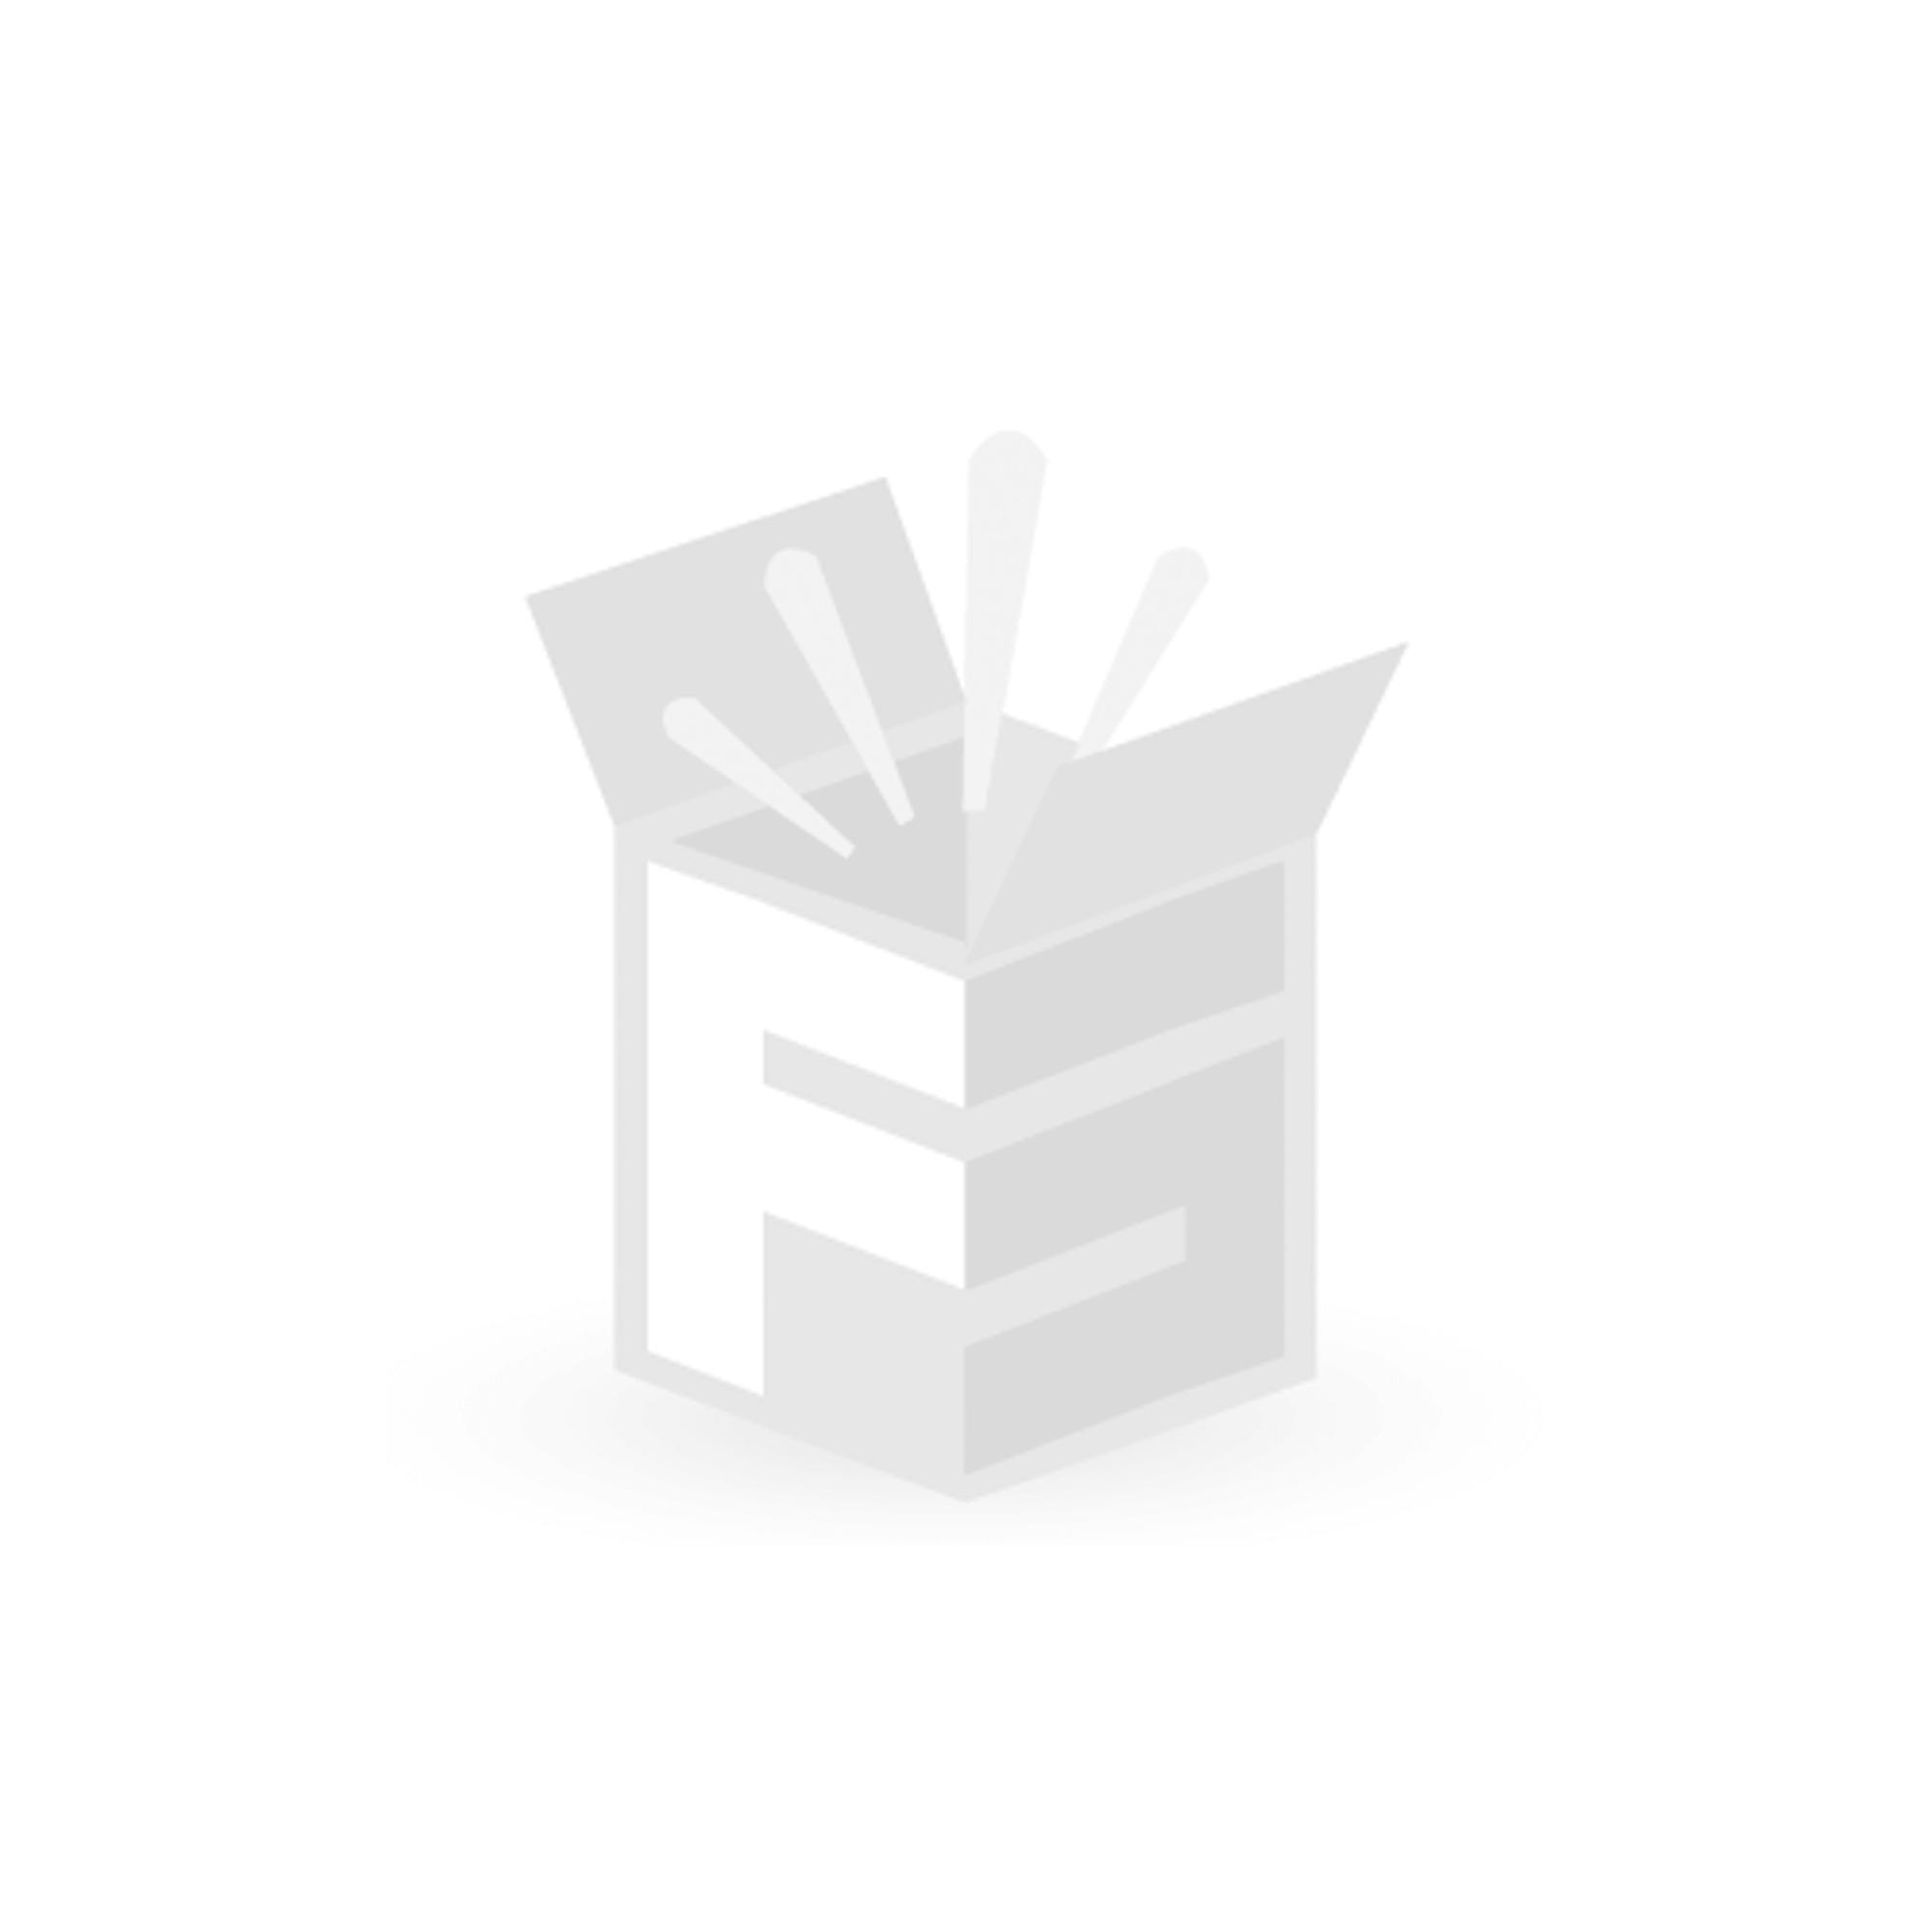 Bosch 3-Tool Set GSR / GKS / GST inkl. 2 x 3.0Ah, Ladegerät und Tasche